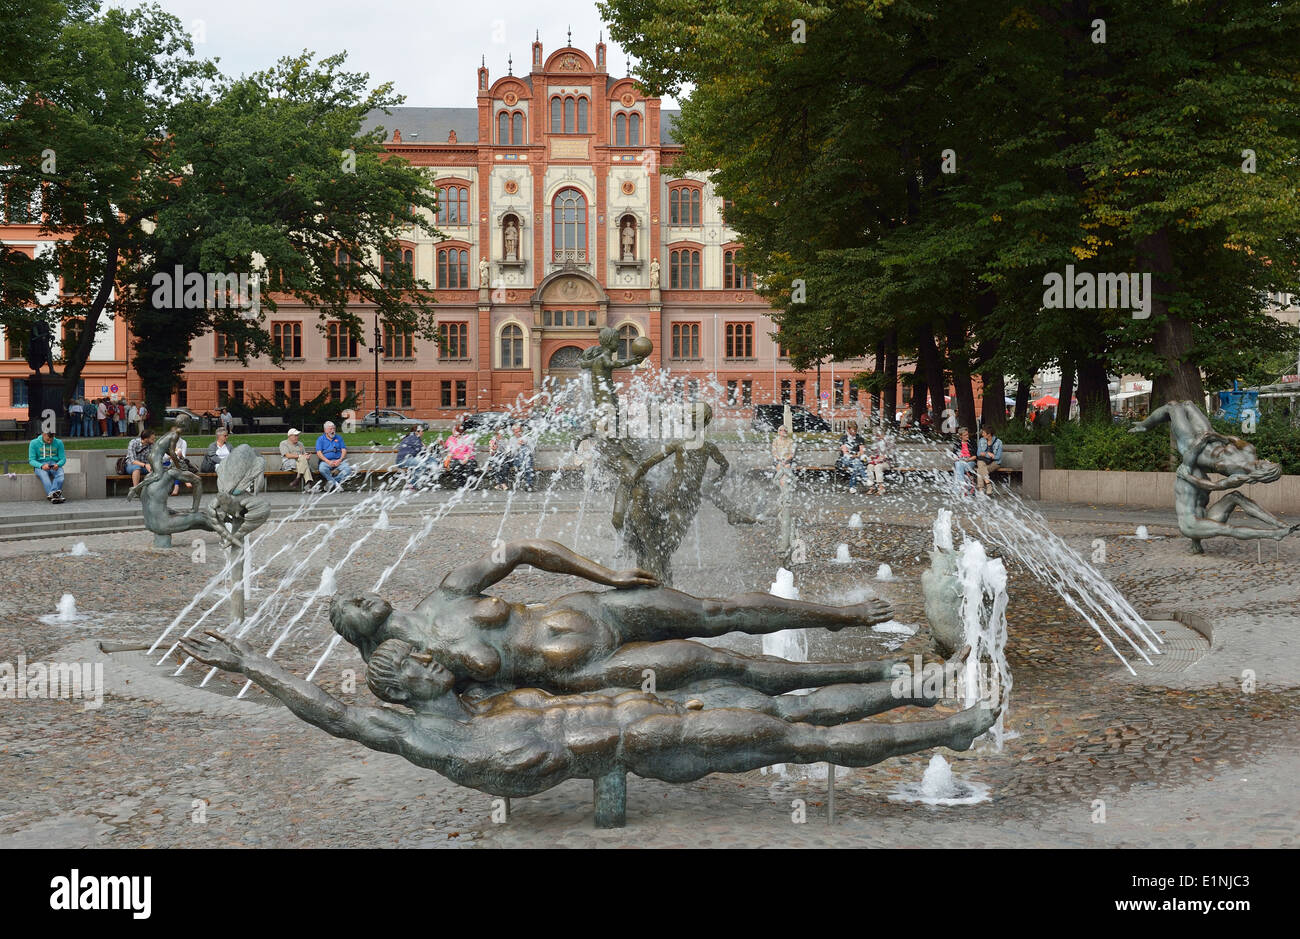 Brunnen Der Lebensfreude Stock Photos & Brunnen Der ...